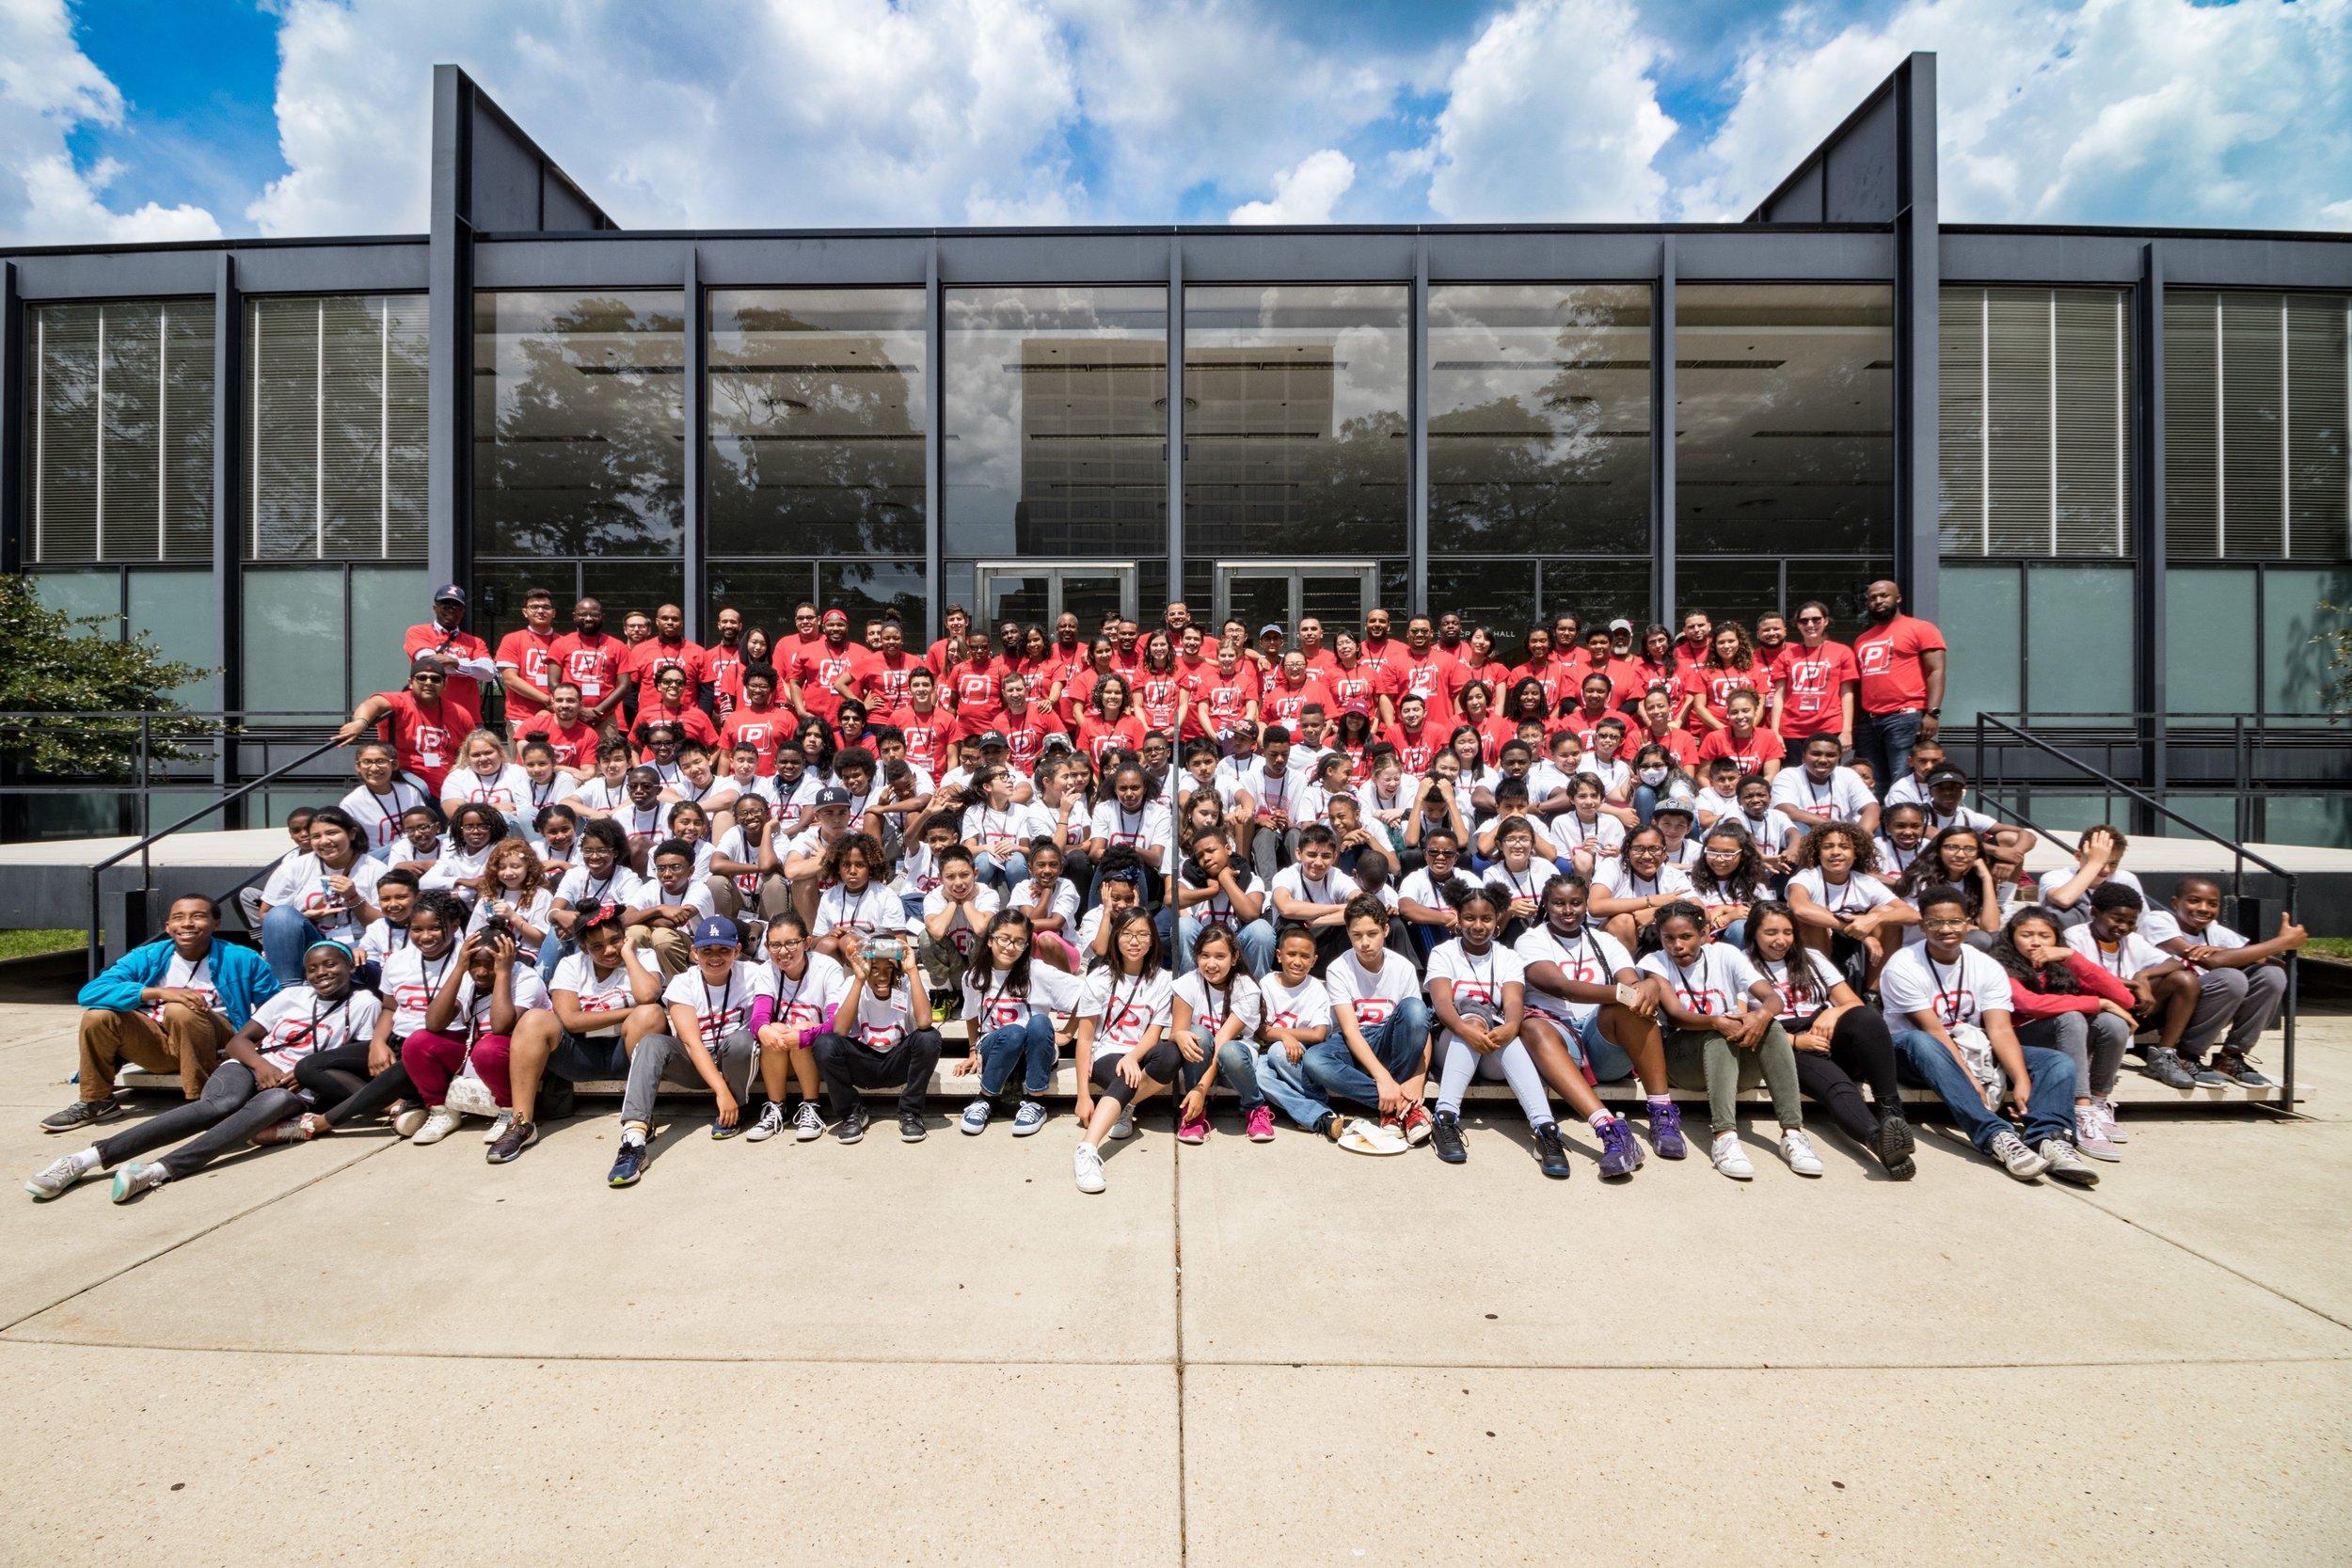 2017 CAMP - 5-Day Camp150 Registered Students113 Volunteers80% Scholarships (FREE)$121,000 Raised$75 Fee2 FAIA Keynote Speakers2 Field Trips